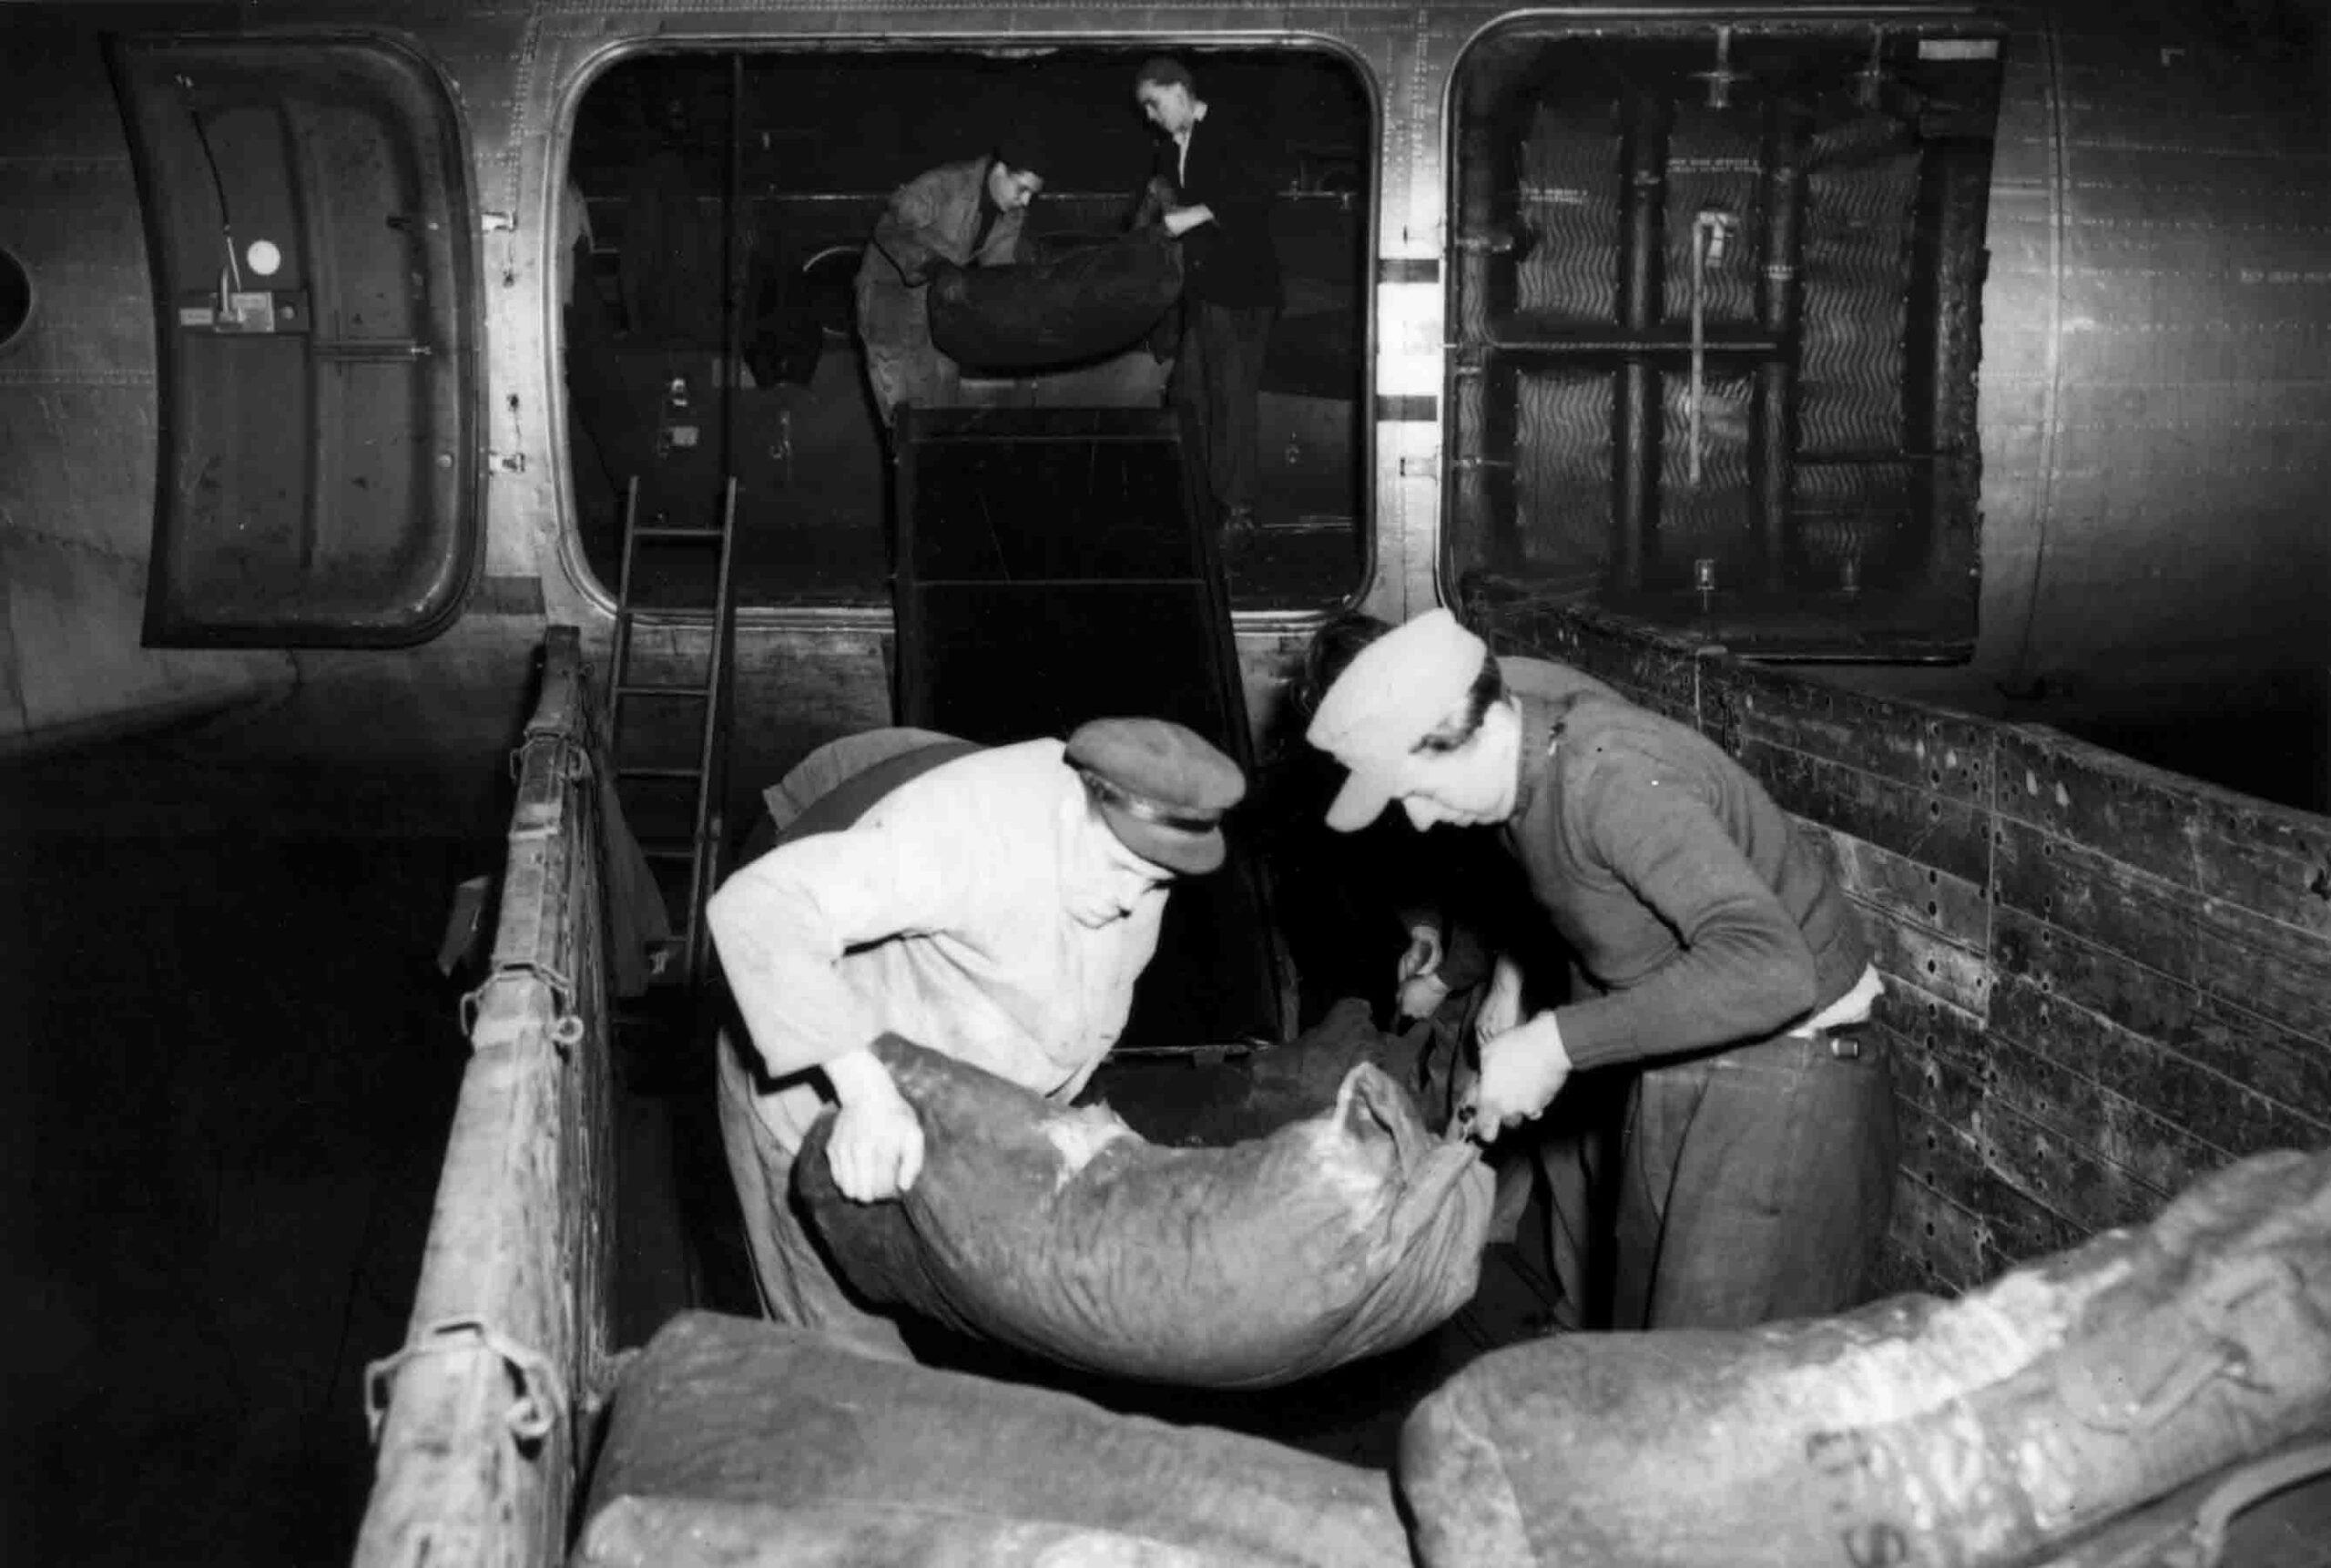 German civilians unloading the Douglas C-54 Skymaster